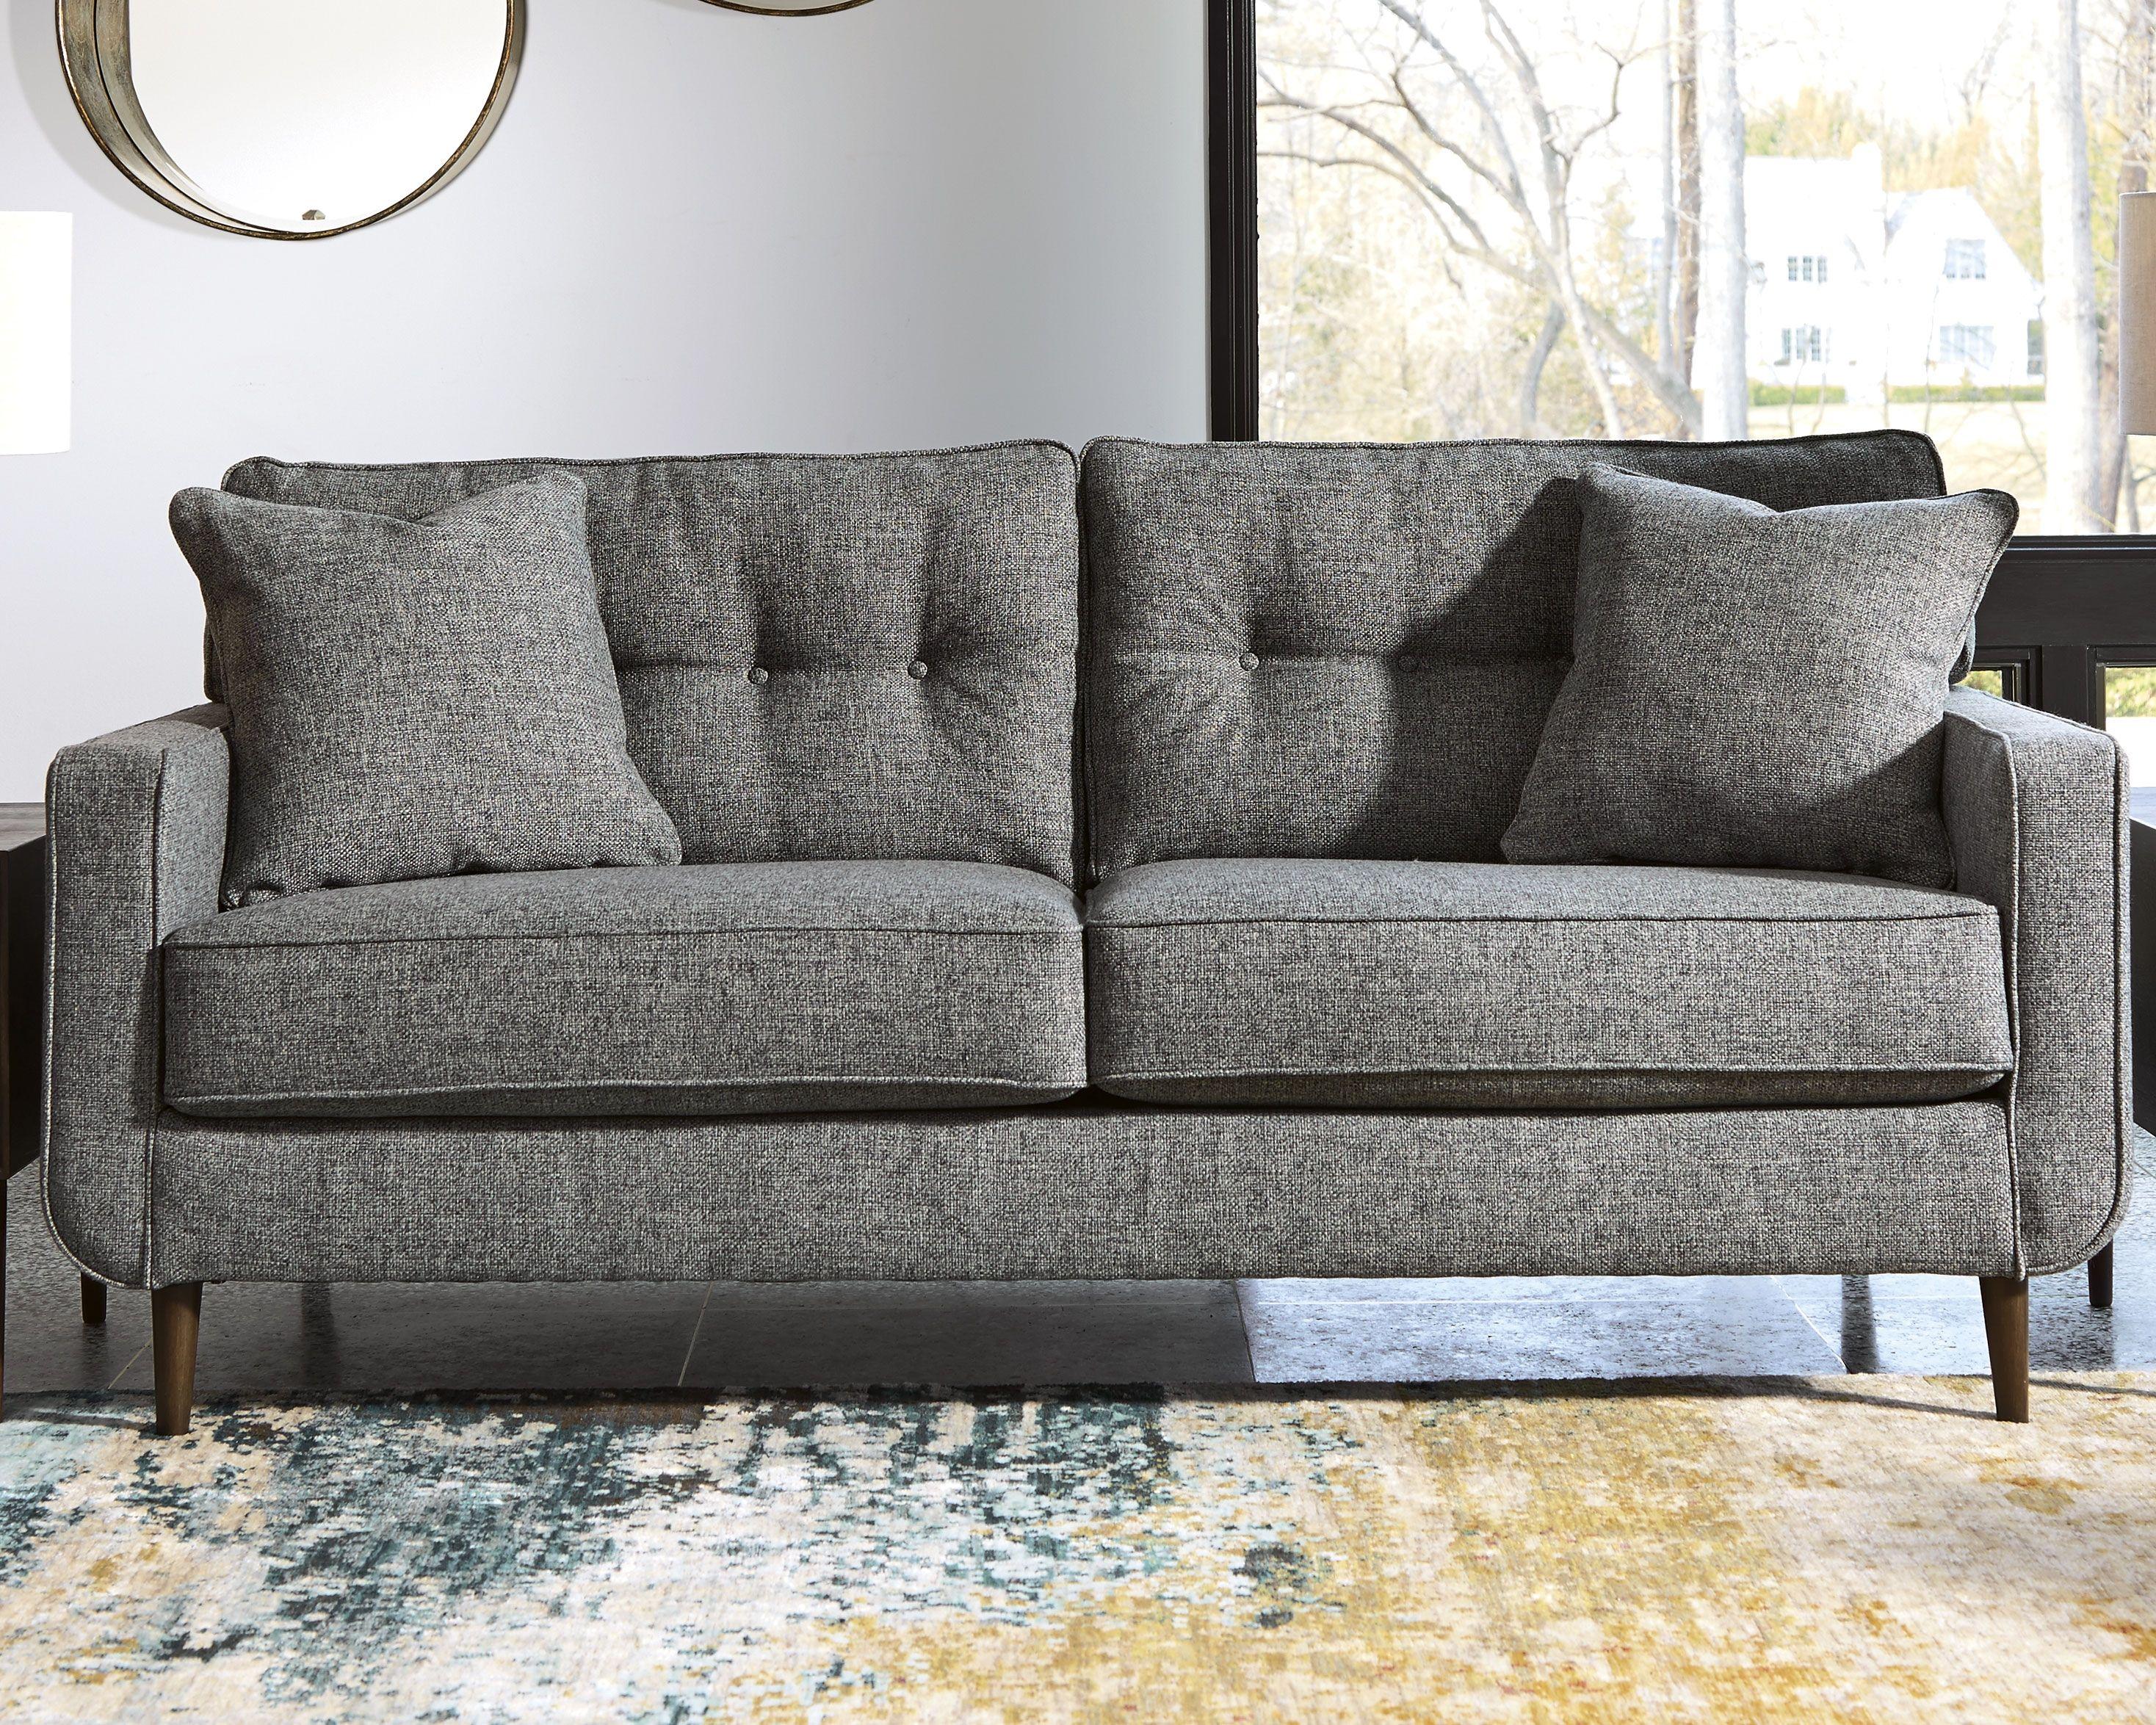 Incredible Zardoni Sofa Charcoal Products In 2019 Charcoal Sofa Evergreenethics Interior Chair Design Evergreenethicsorg